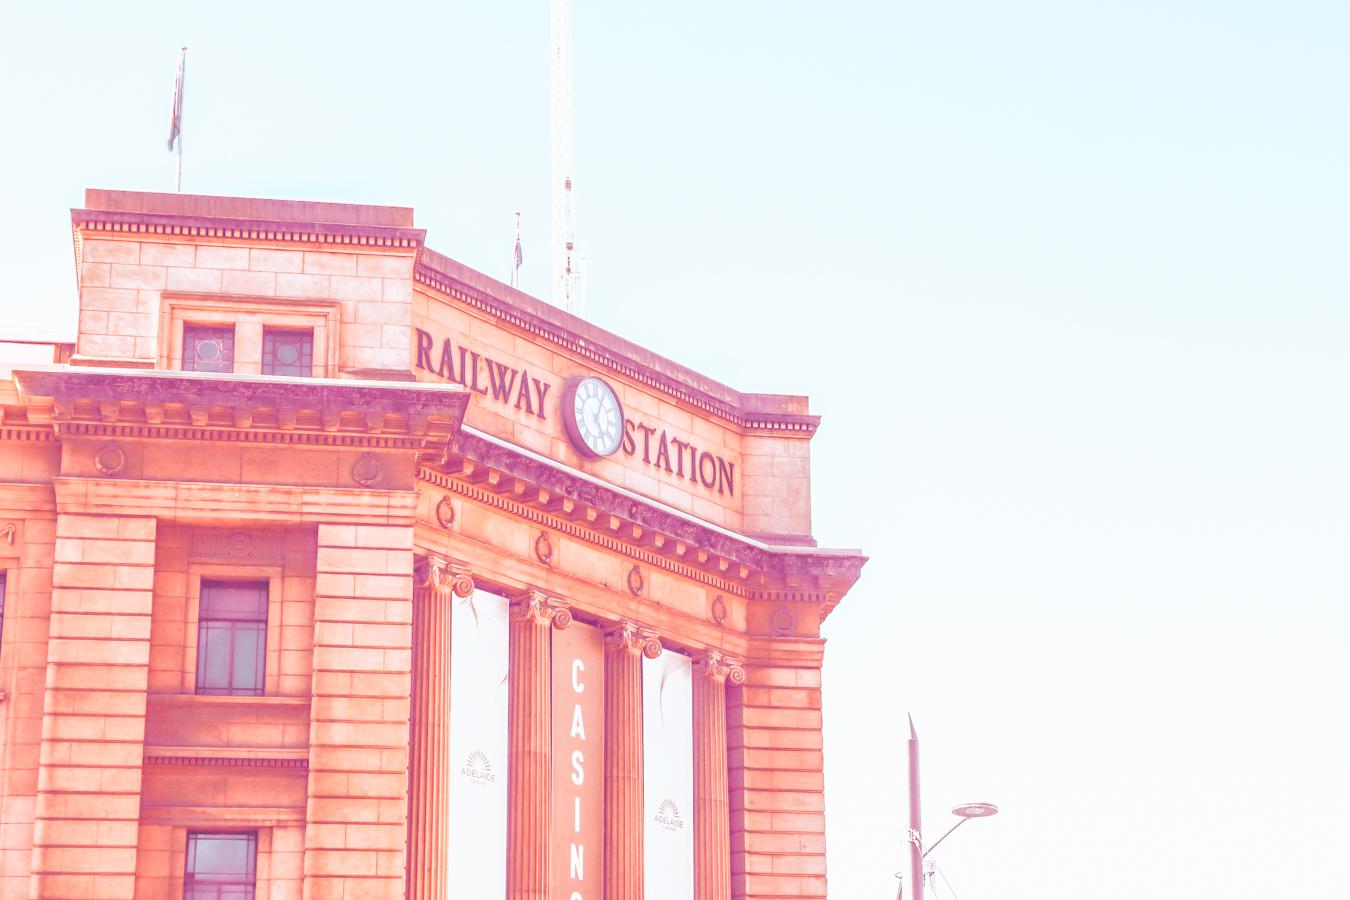 Railway station of Adelaide